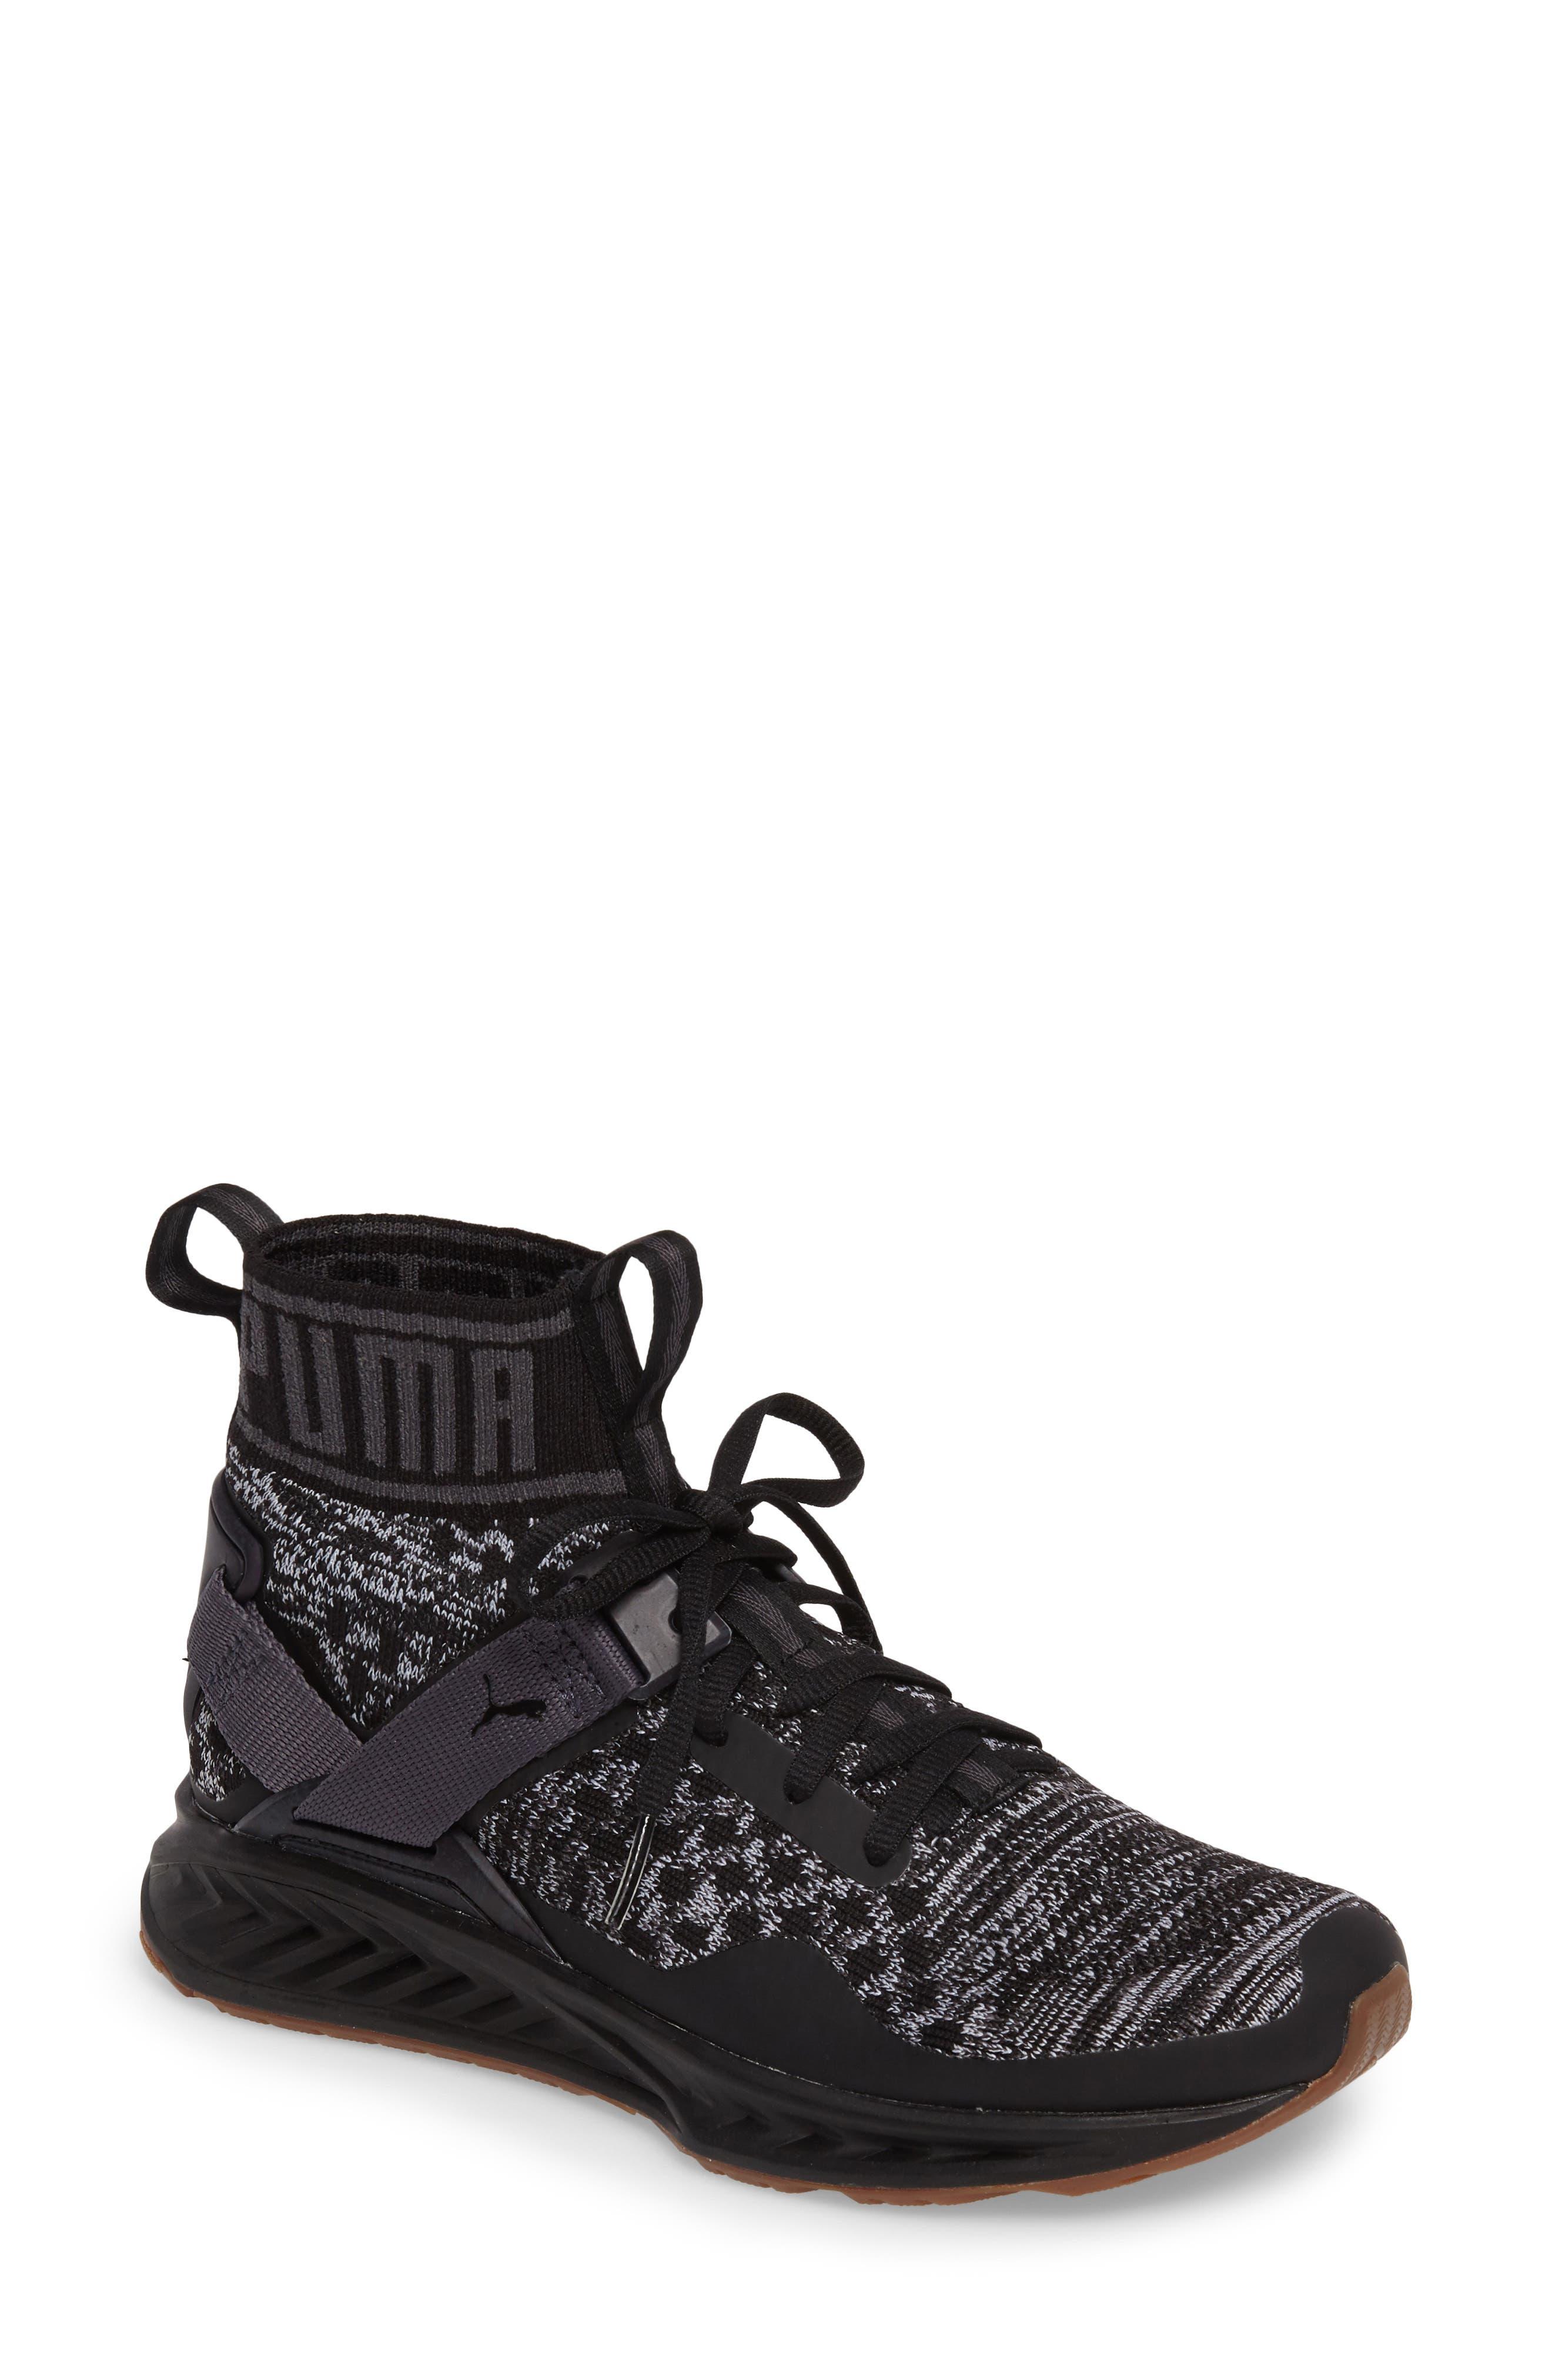 puma running shoes for women. main image - puma ignite evoknit running shoe (women) puma shoes for women